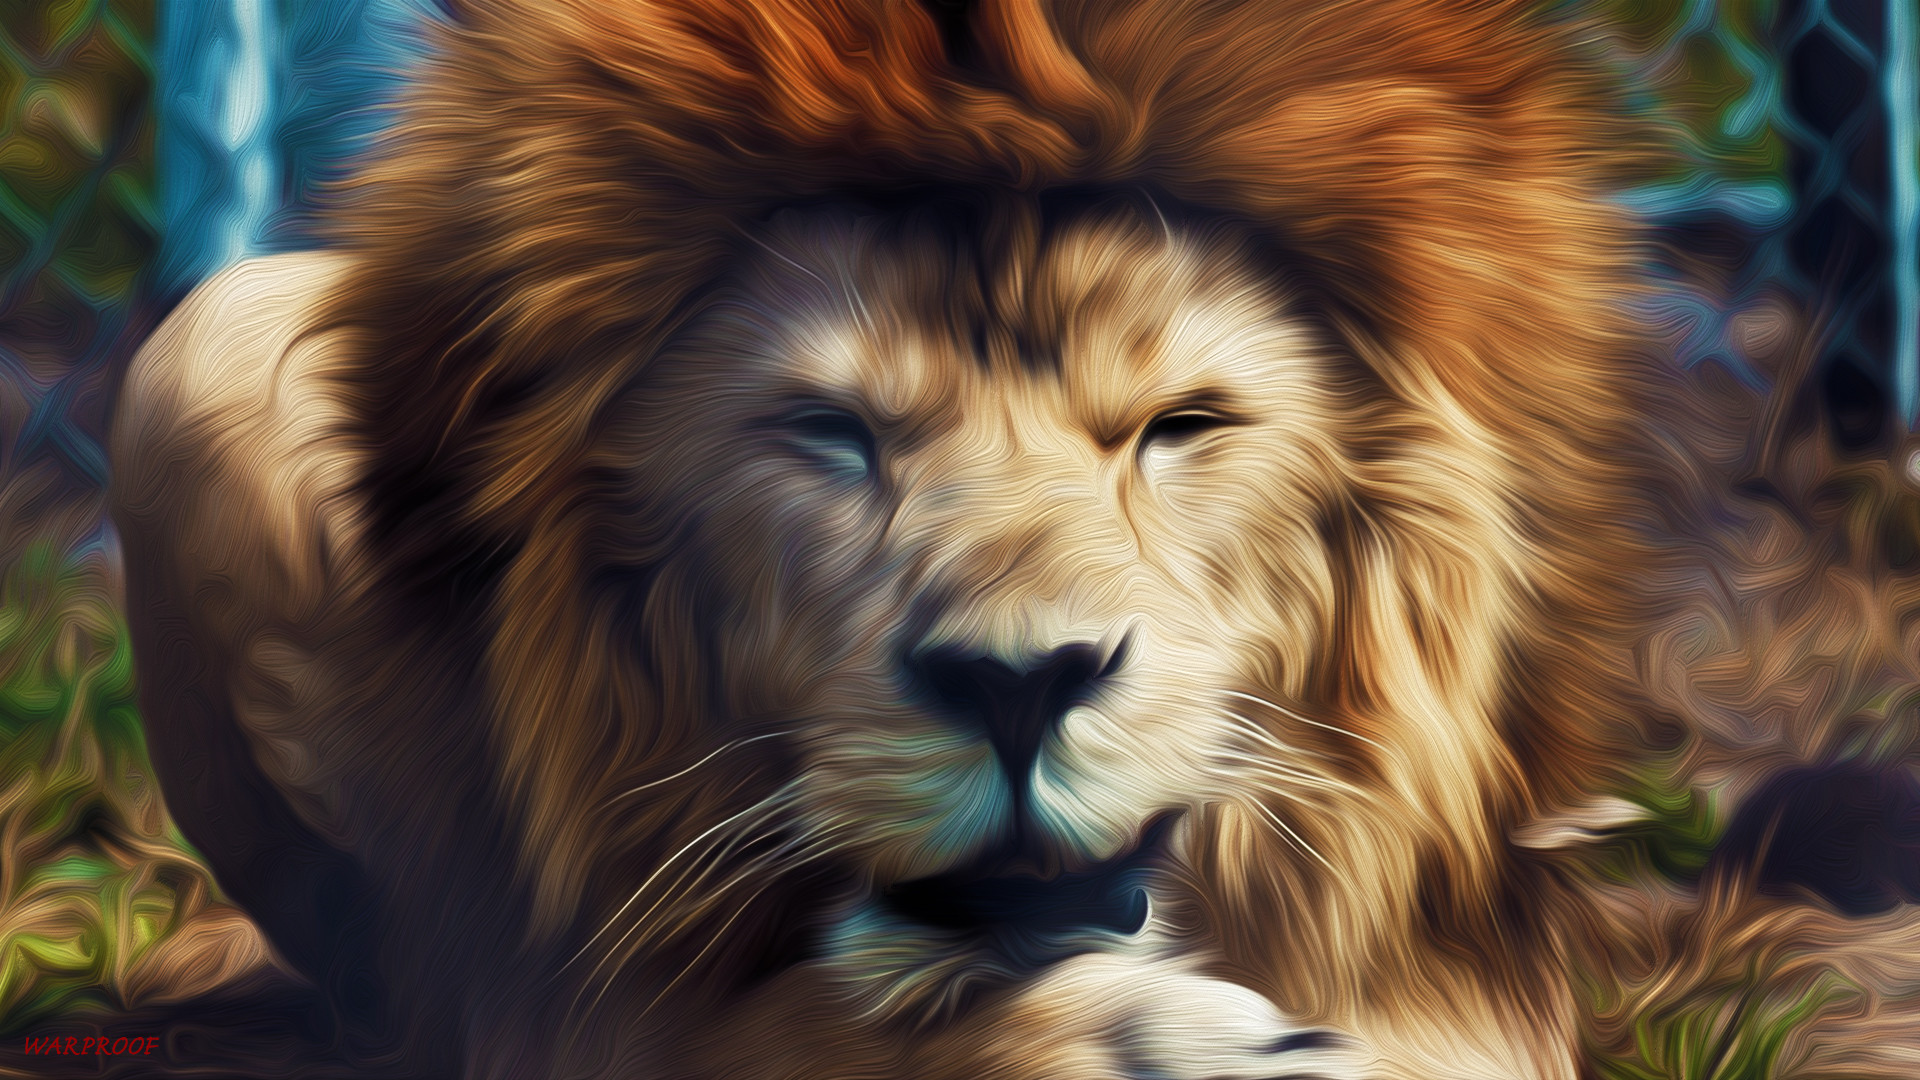 Abstract Lion Face Shaped Design QHD Wallpaper Wallpaper Vactual